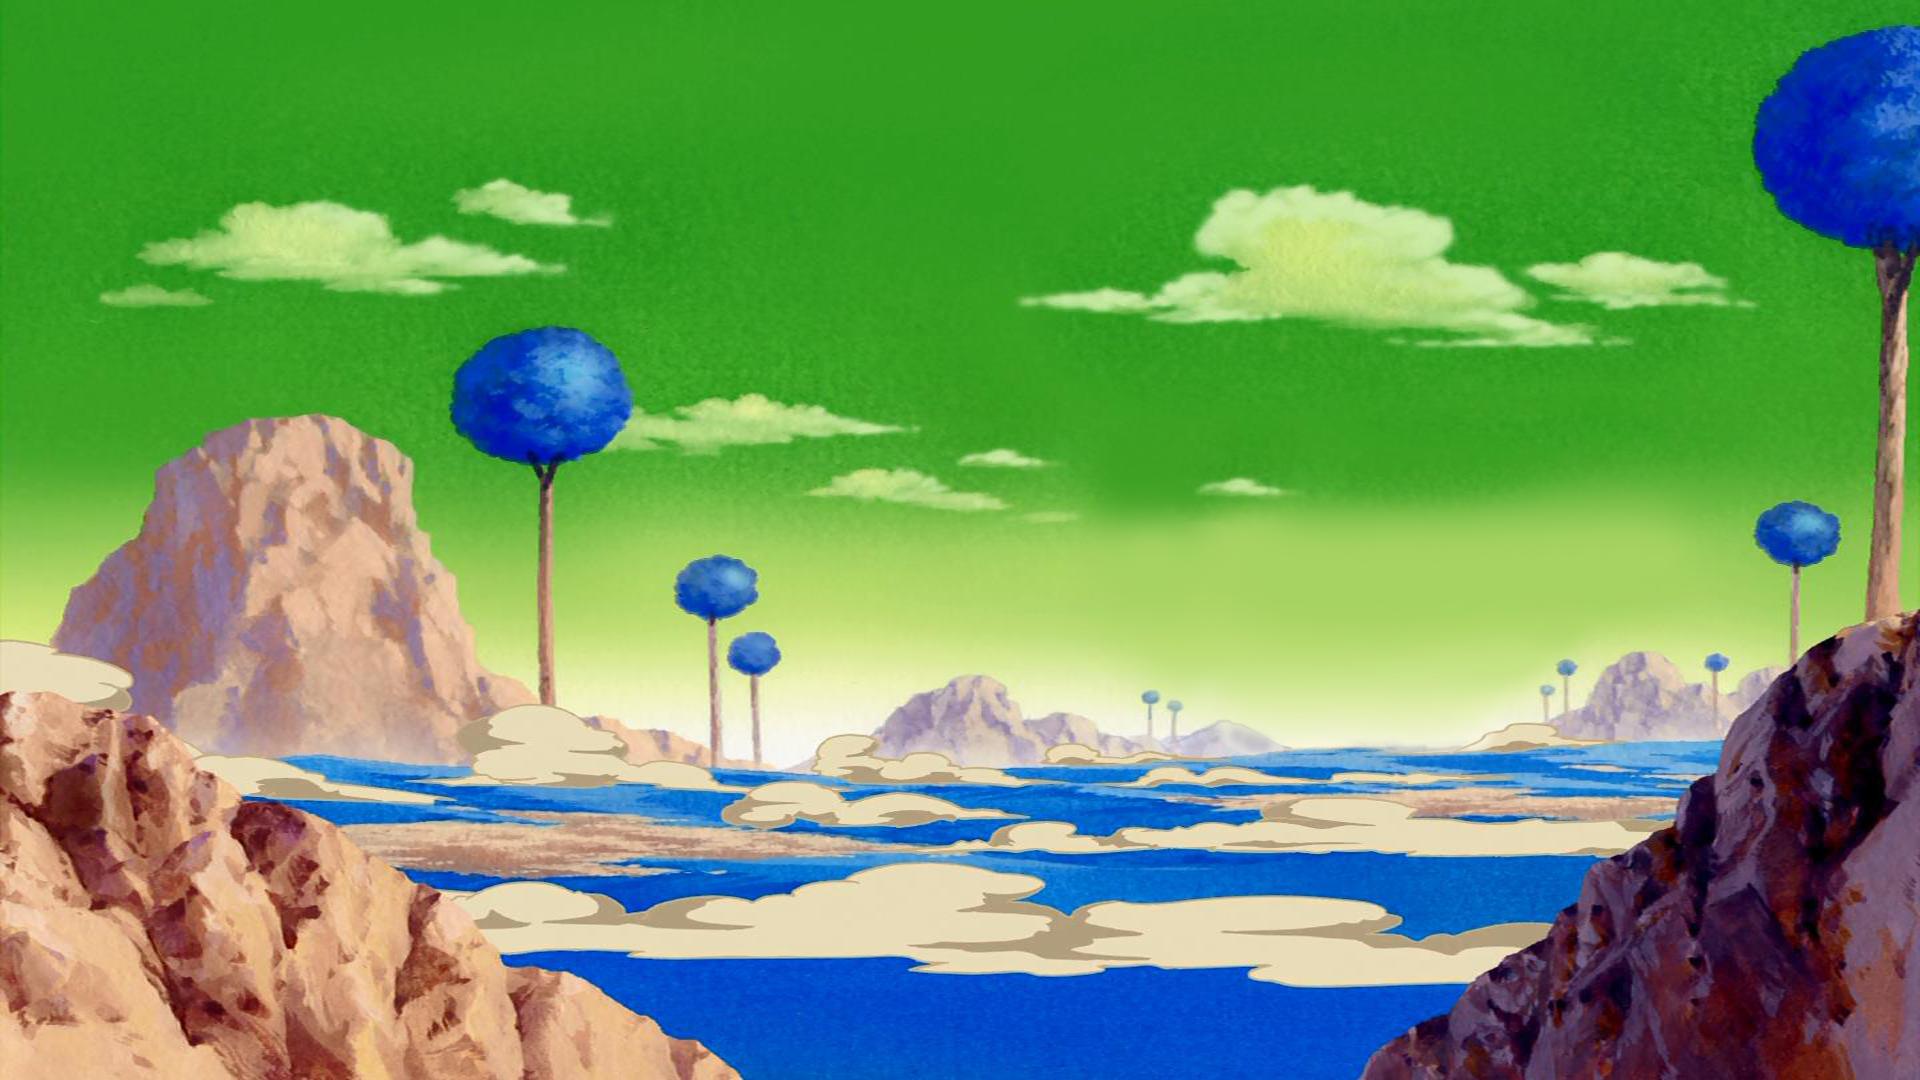 1920x1080 Planet Namek Wallpaper Background Image View Download